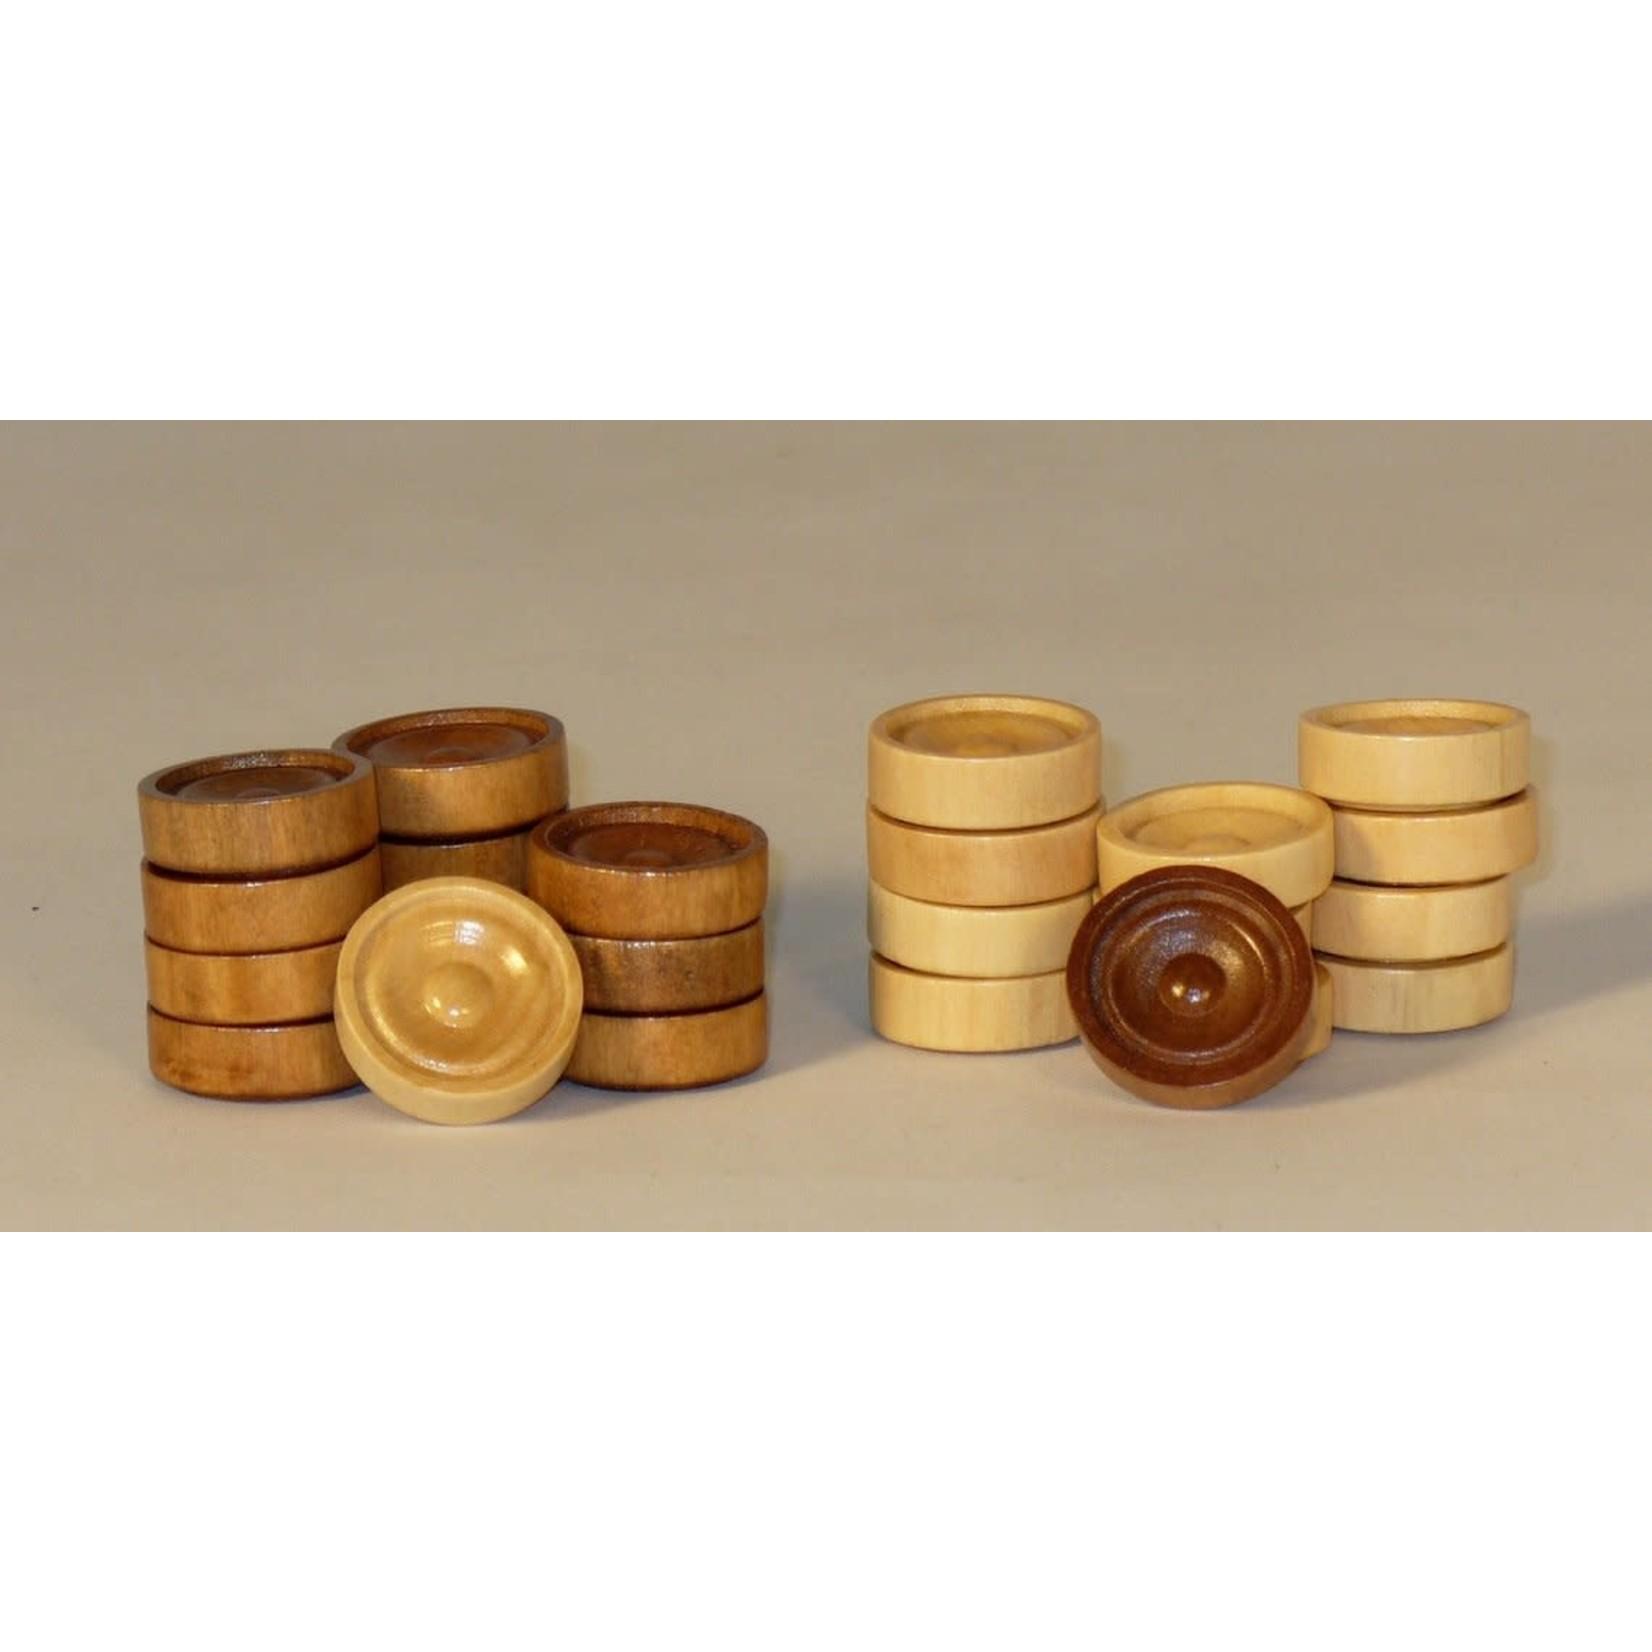 WorldWise Imports Wood Checkers